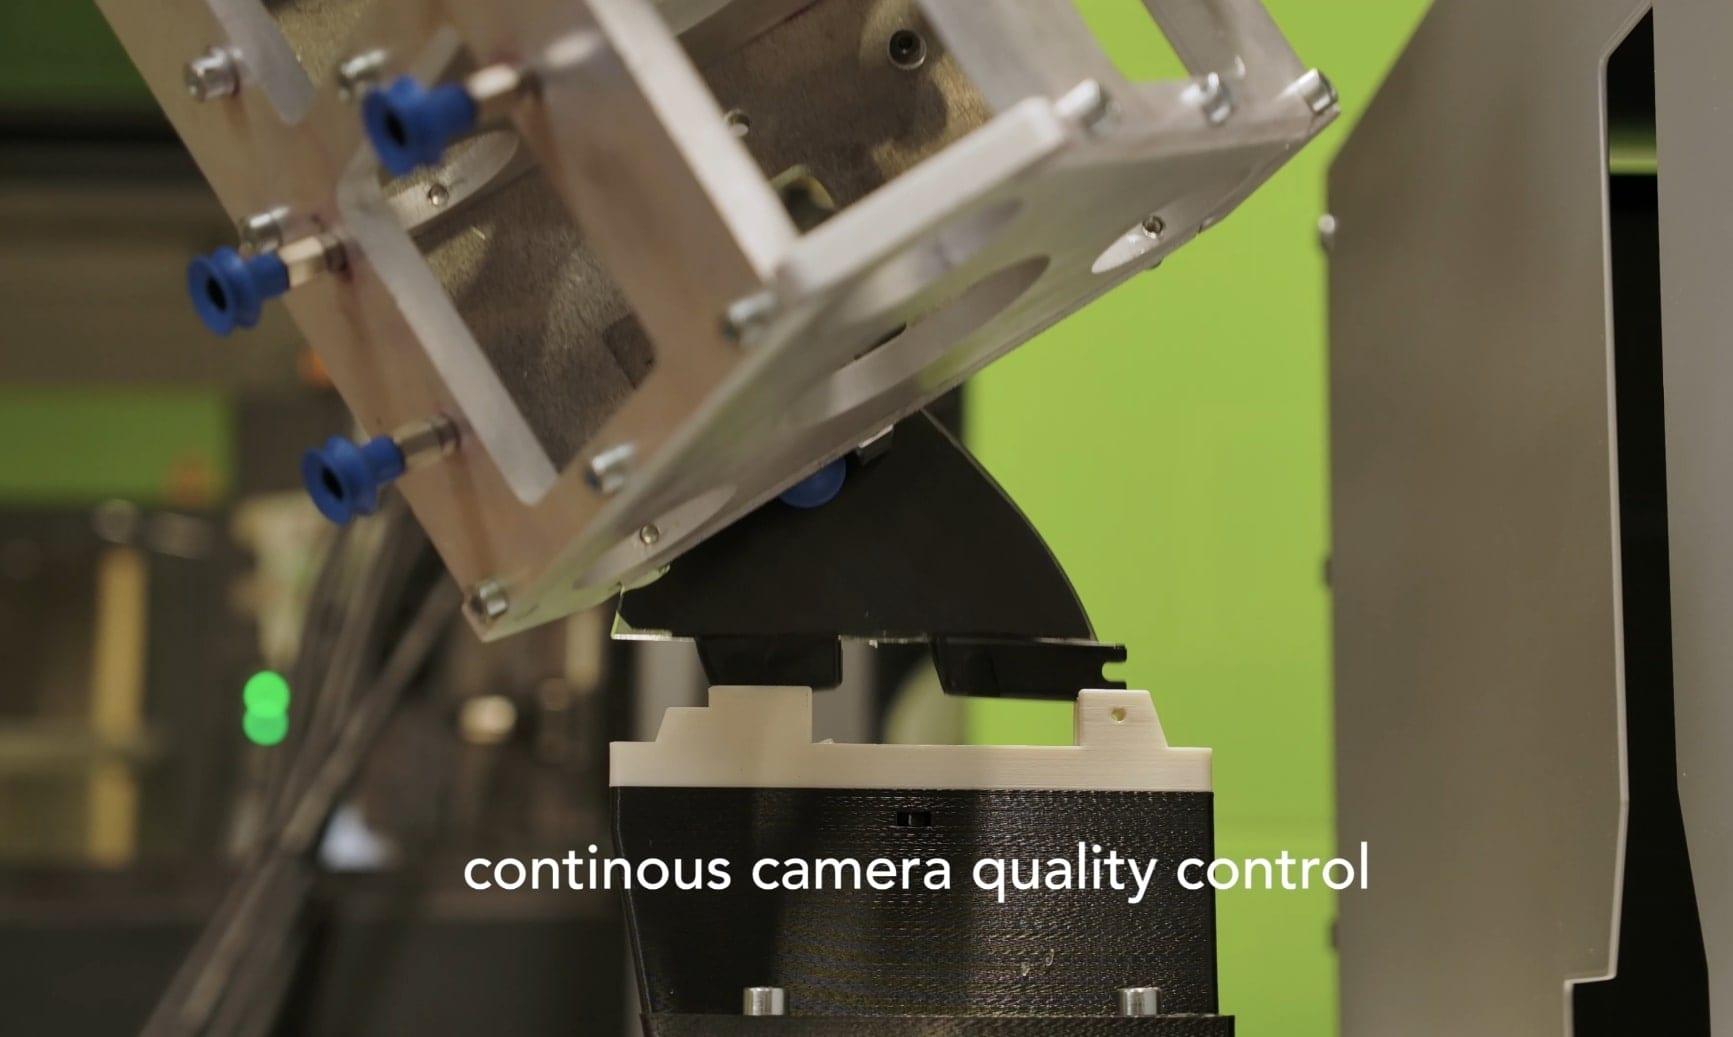 continous-camera-quality-control